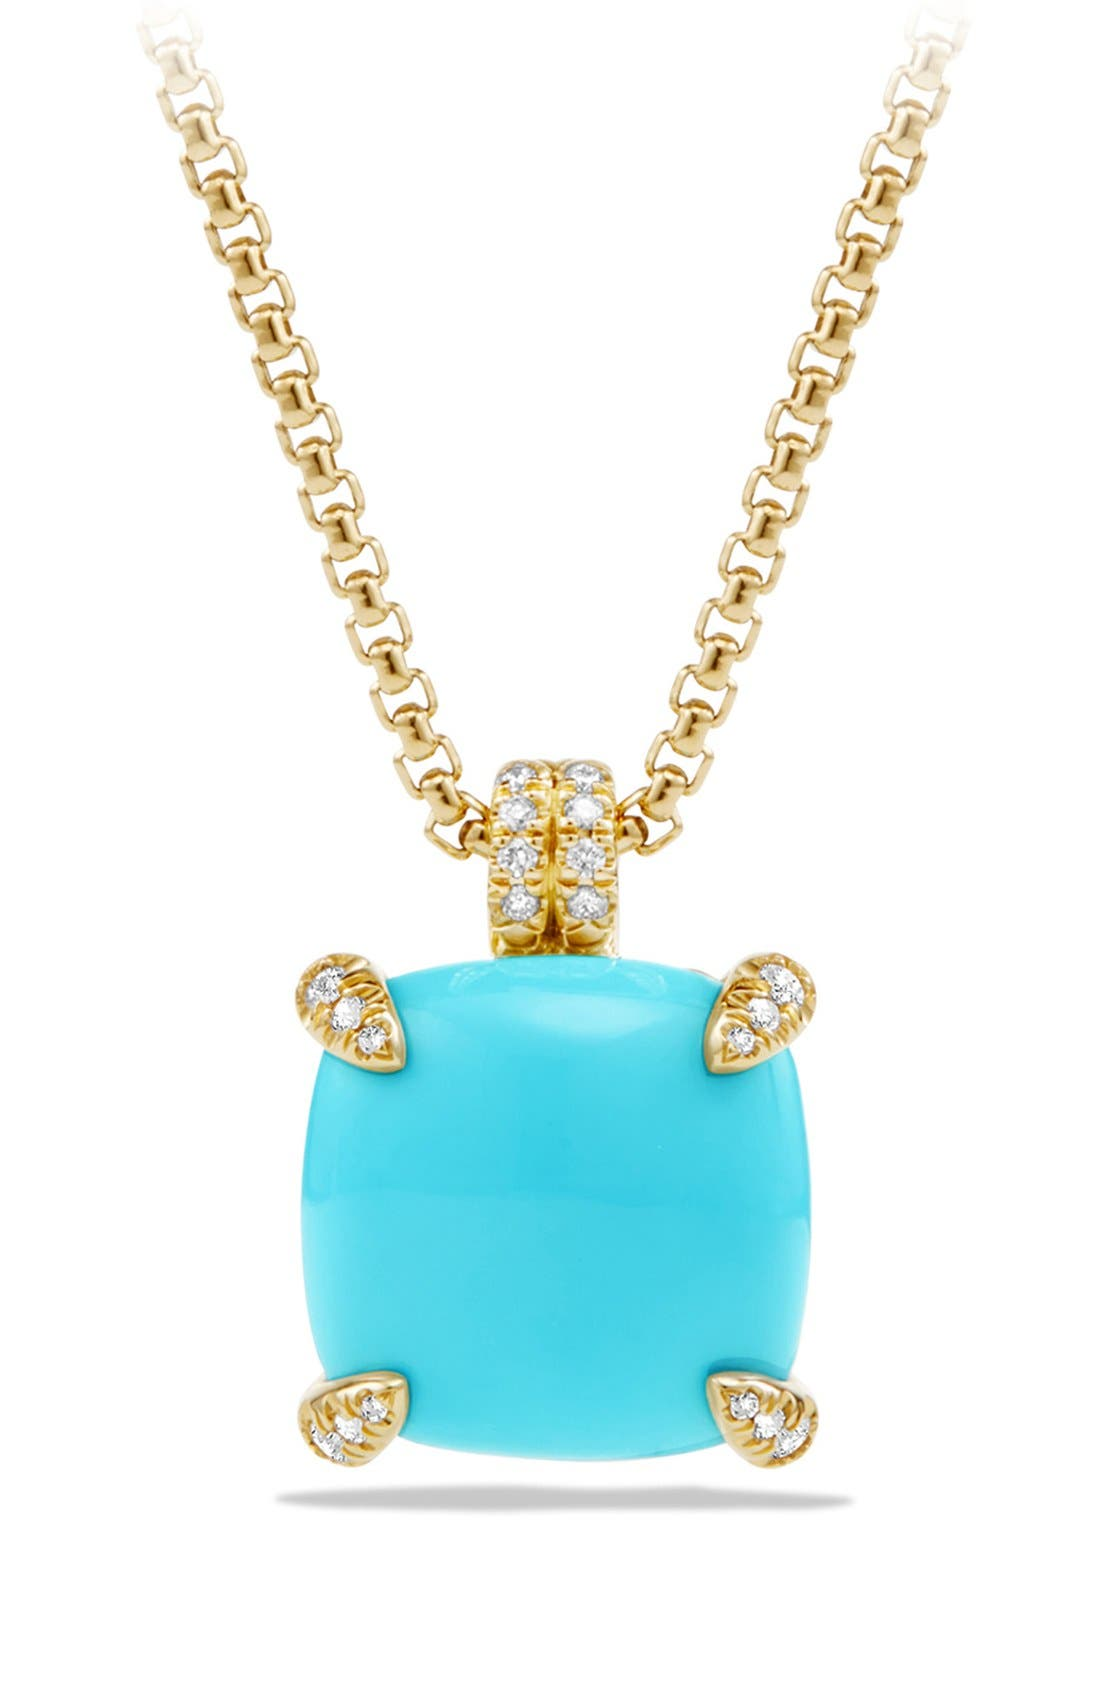 Main Image - David Yurman 'Châtelaine' Pendant Necklace with Diamonds in 18K Gold